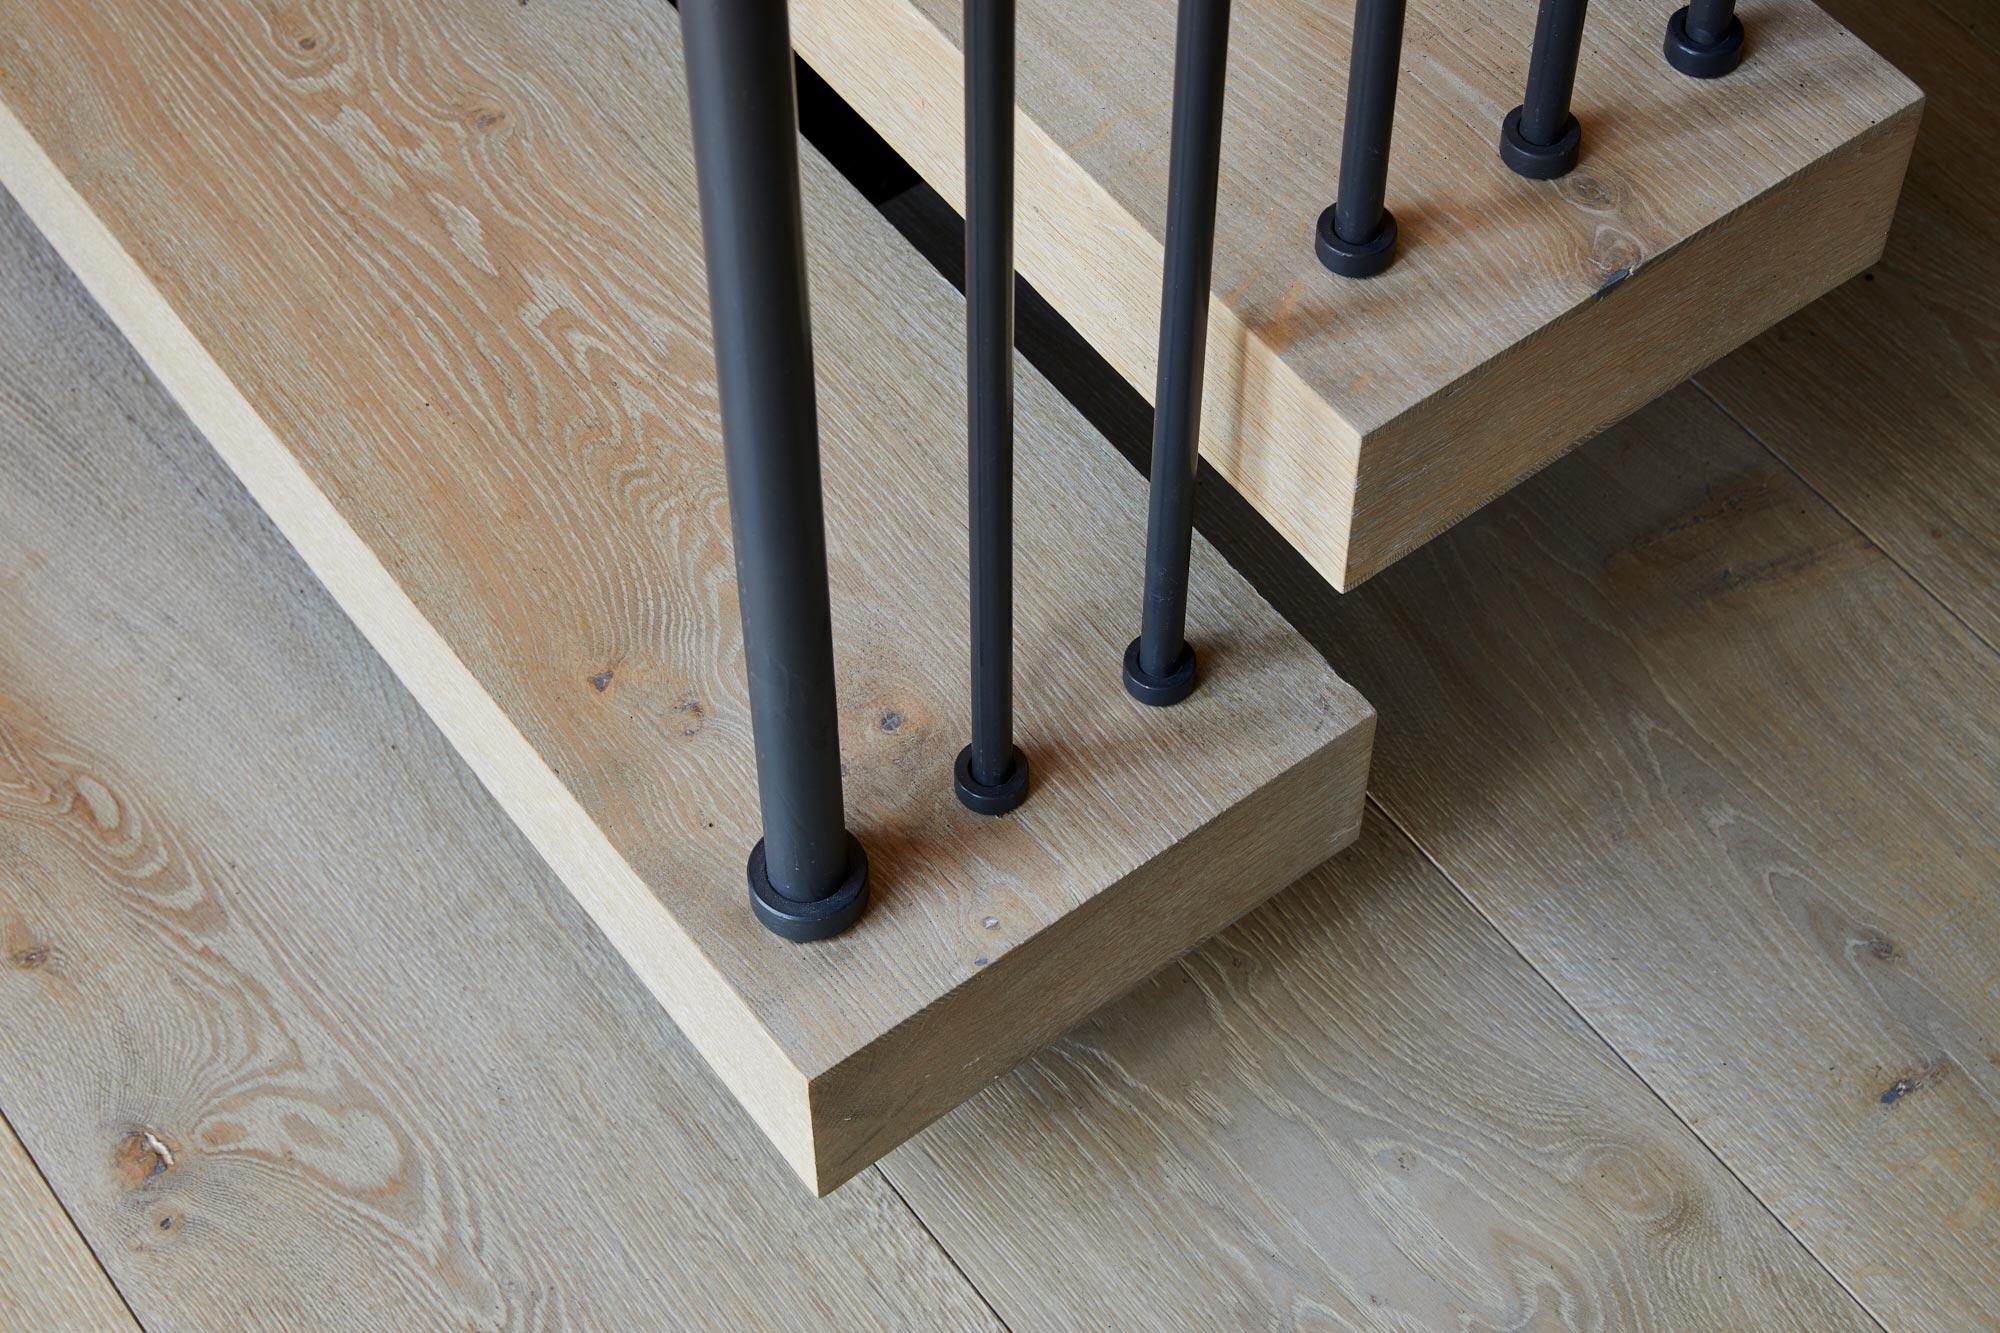 Bespoke oak flooring and staincase